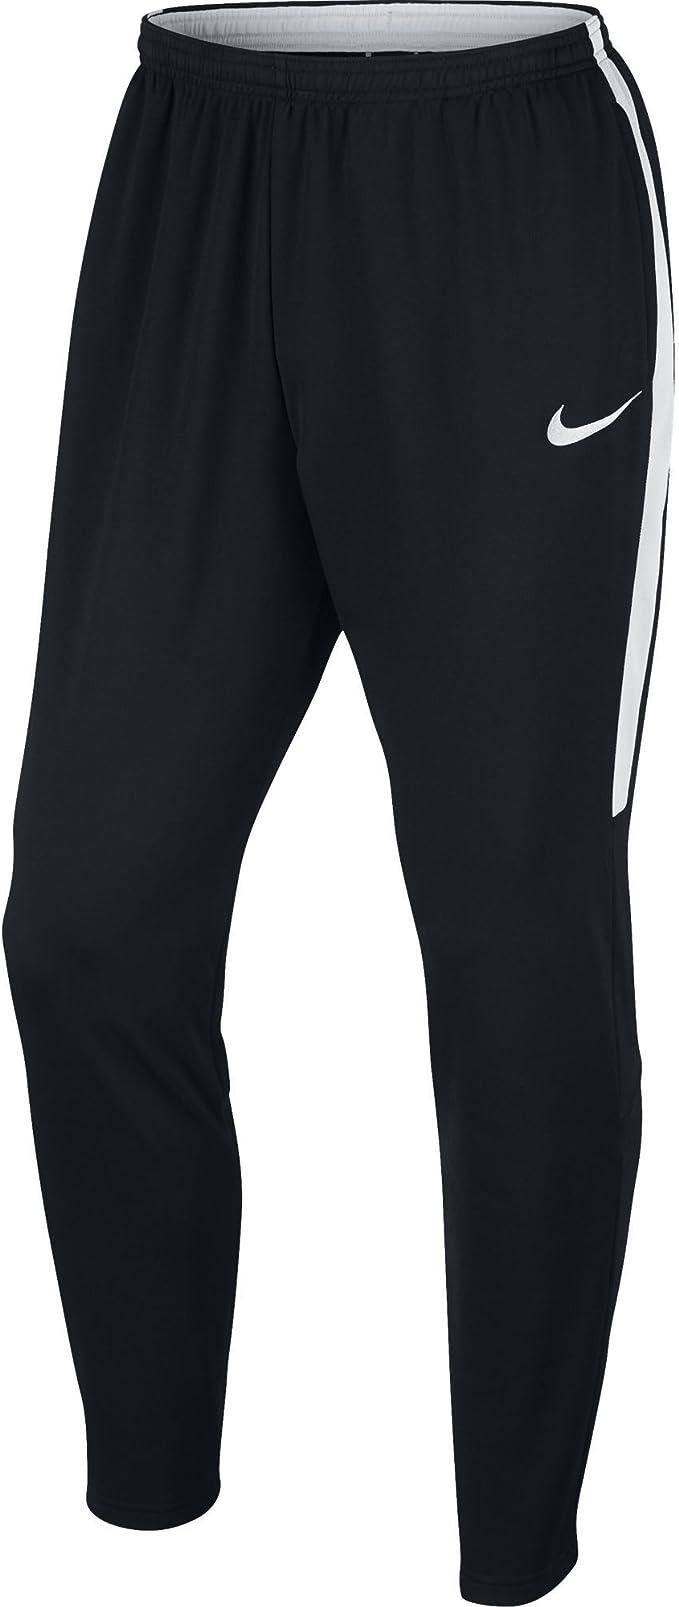 recoger limpiador inundar  Amazon.com : Nike Men's Dry Academy Football Pant (L, Black/White) :  Clothing